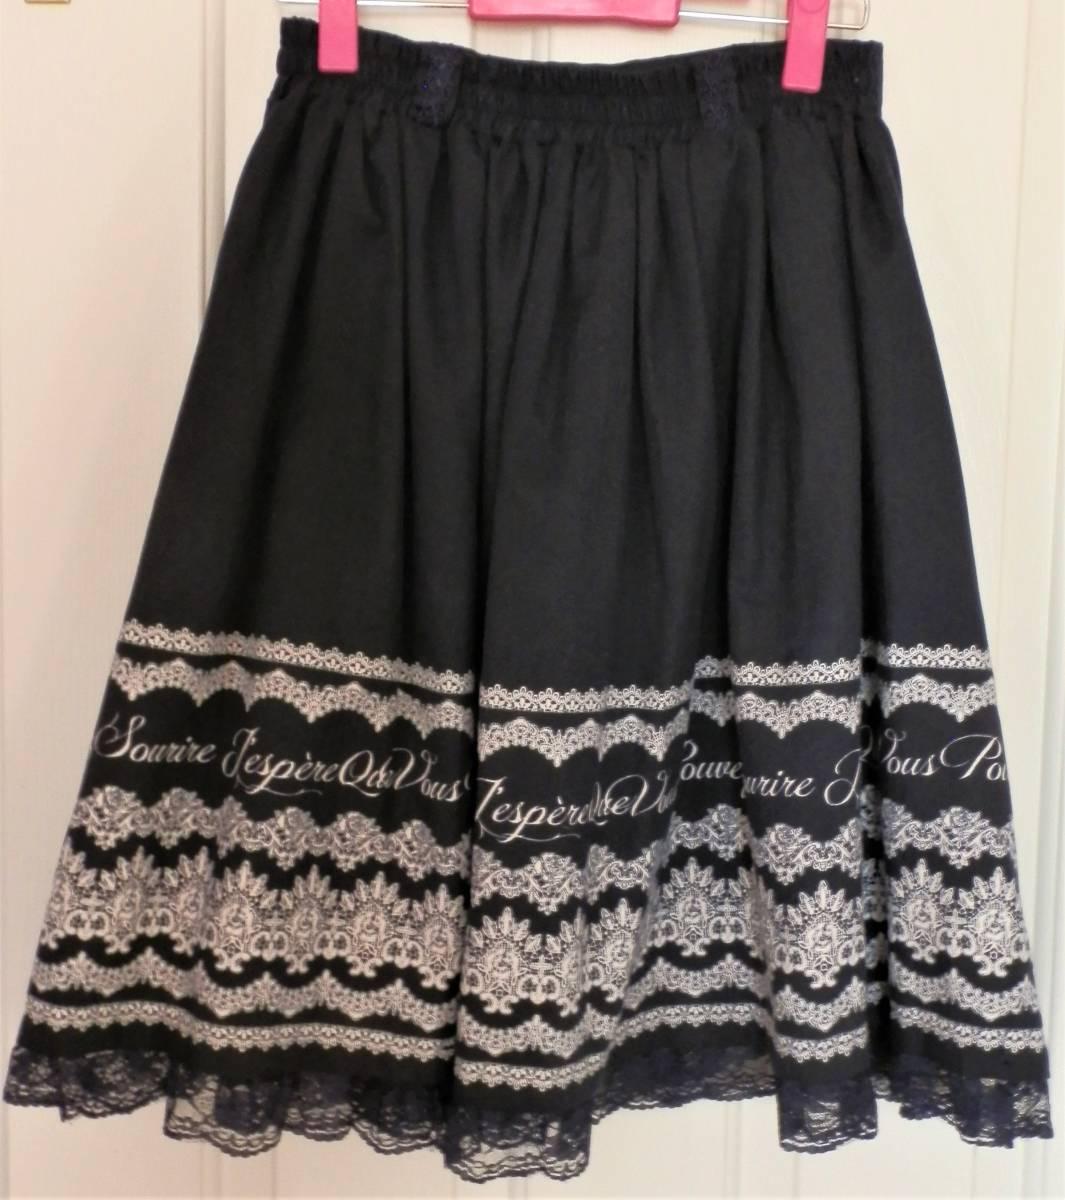 axes femme/アクシーズ/ 裾プリントがステキなたっぷりフレアスカート